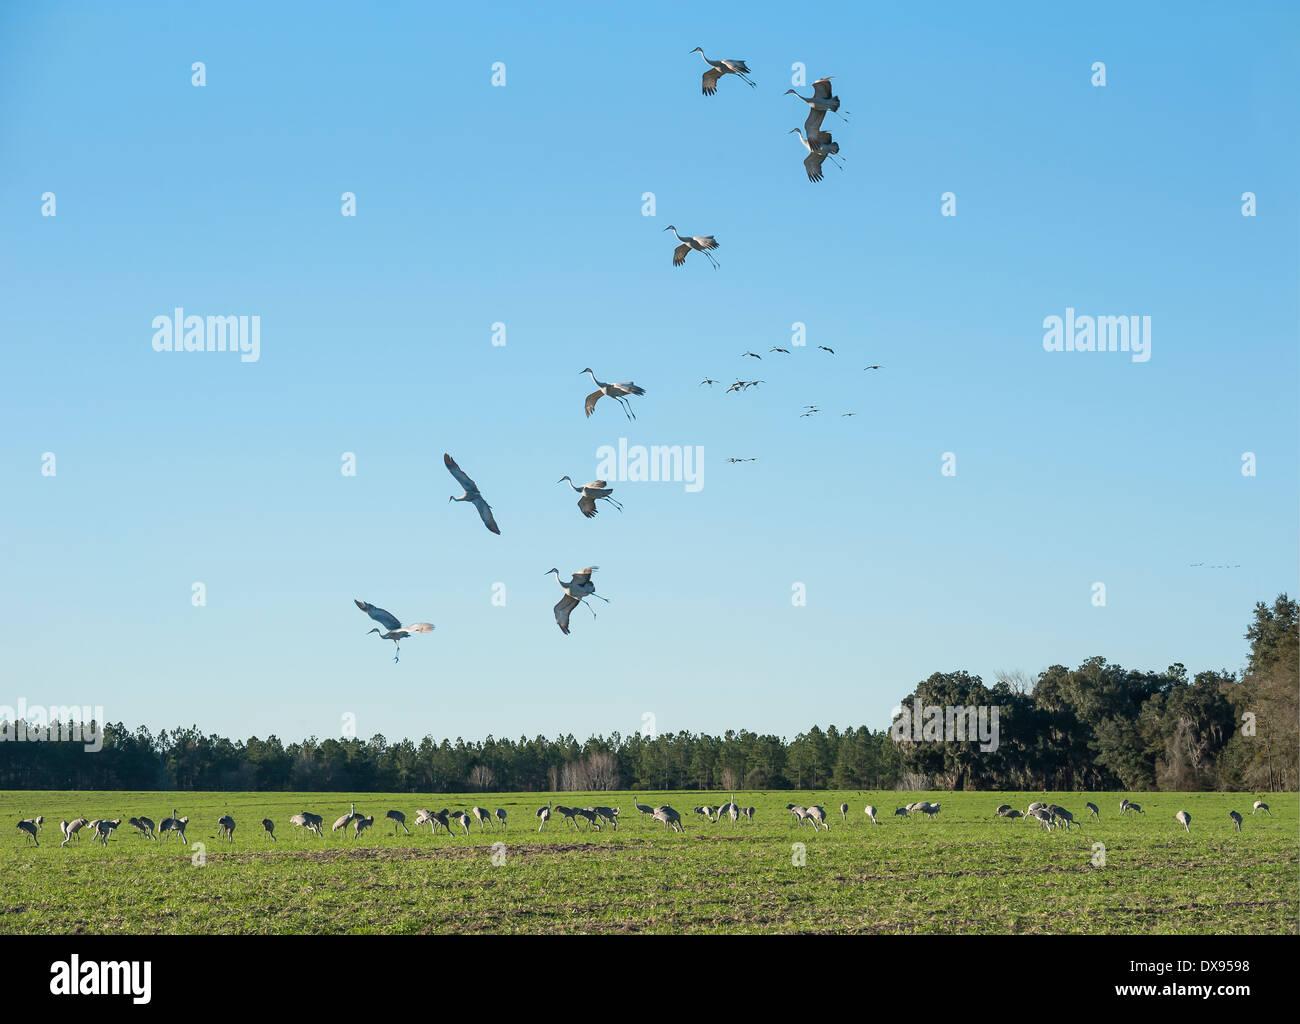 Sandhill Cranes alight in field with more feeding cranes - Stock Image